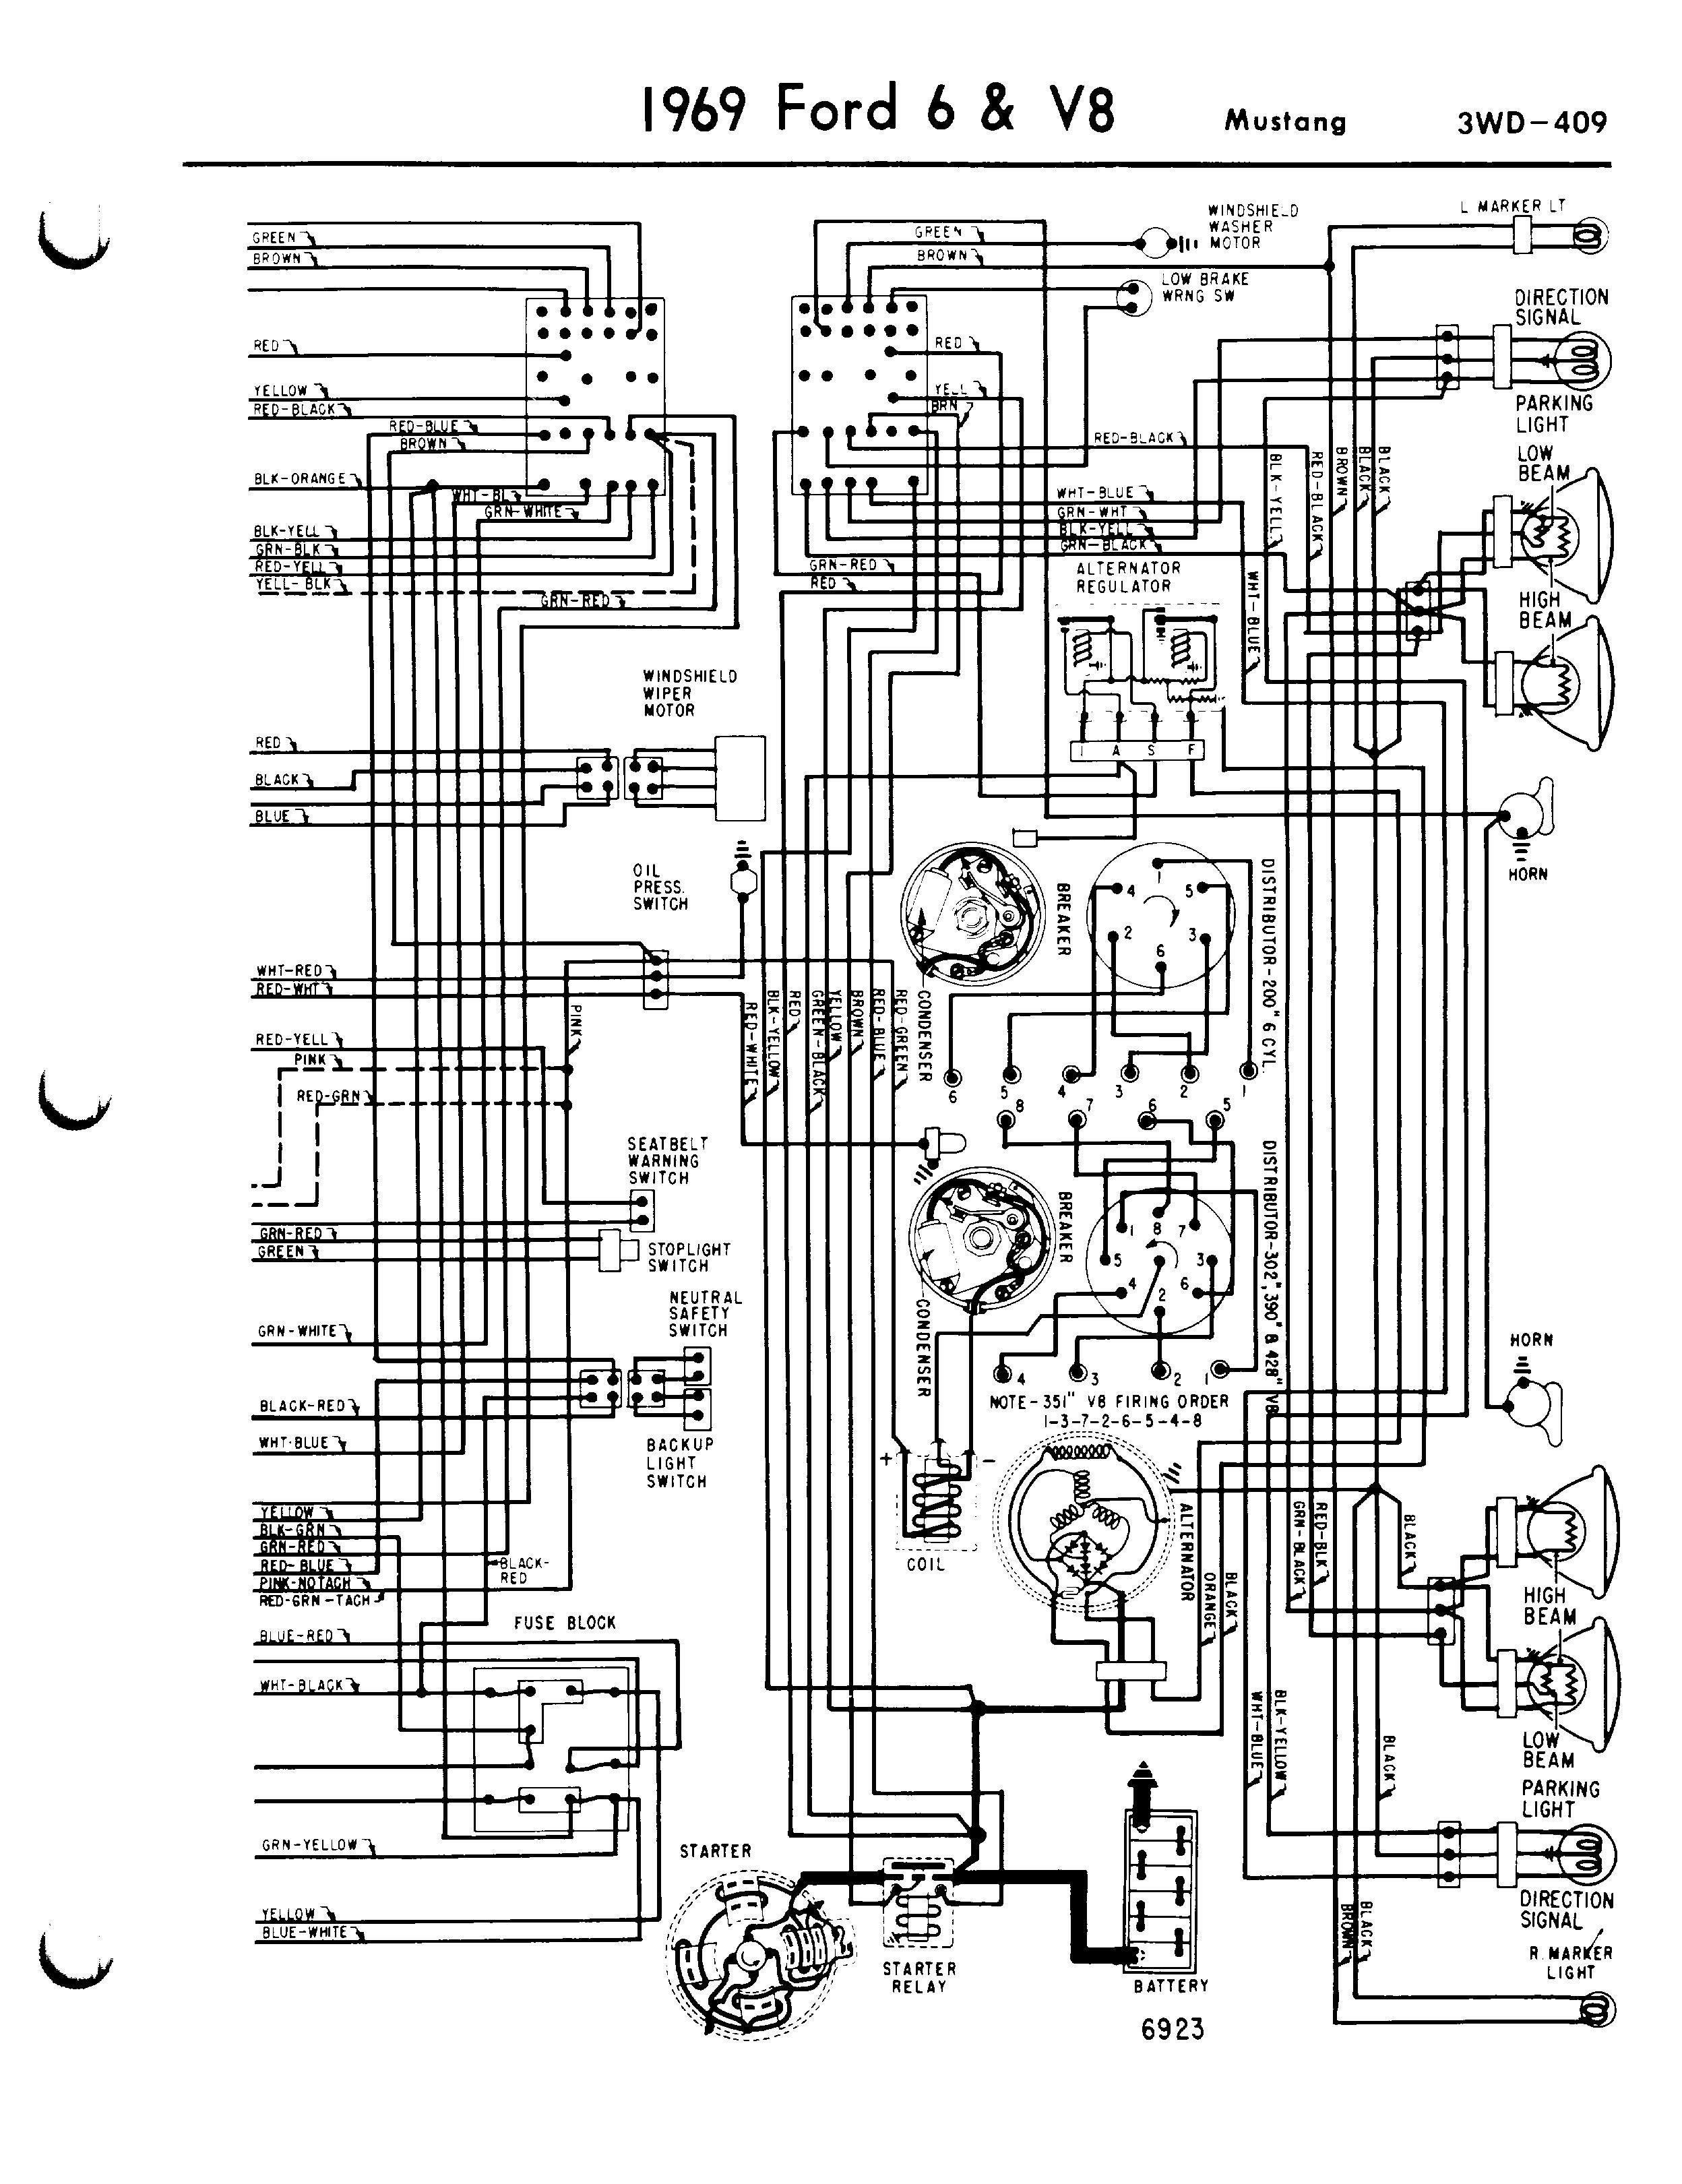 Big Dog Motorcycle Wiring Diagram 5225a1 Big Dog Wire Diagram Of Big Dog Motorcycle Wiring Diagram